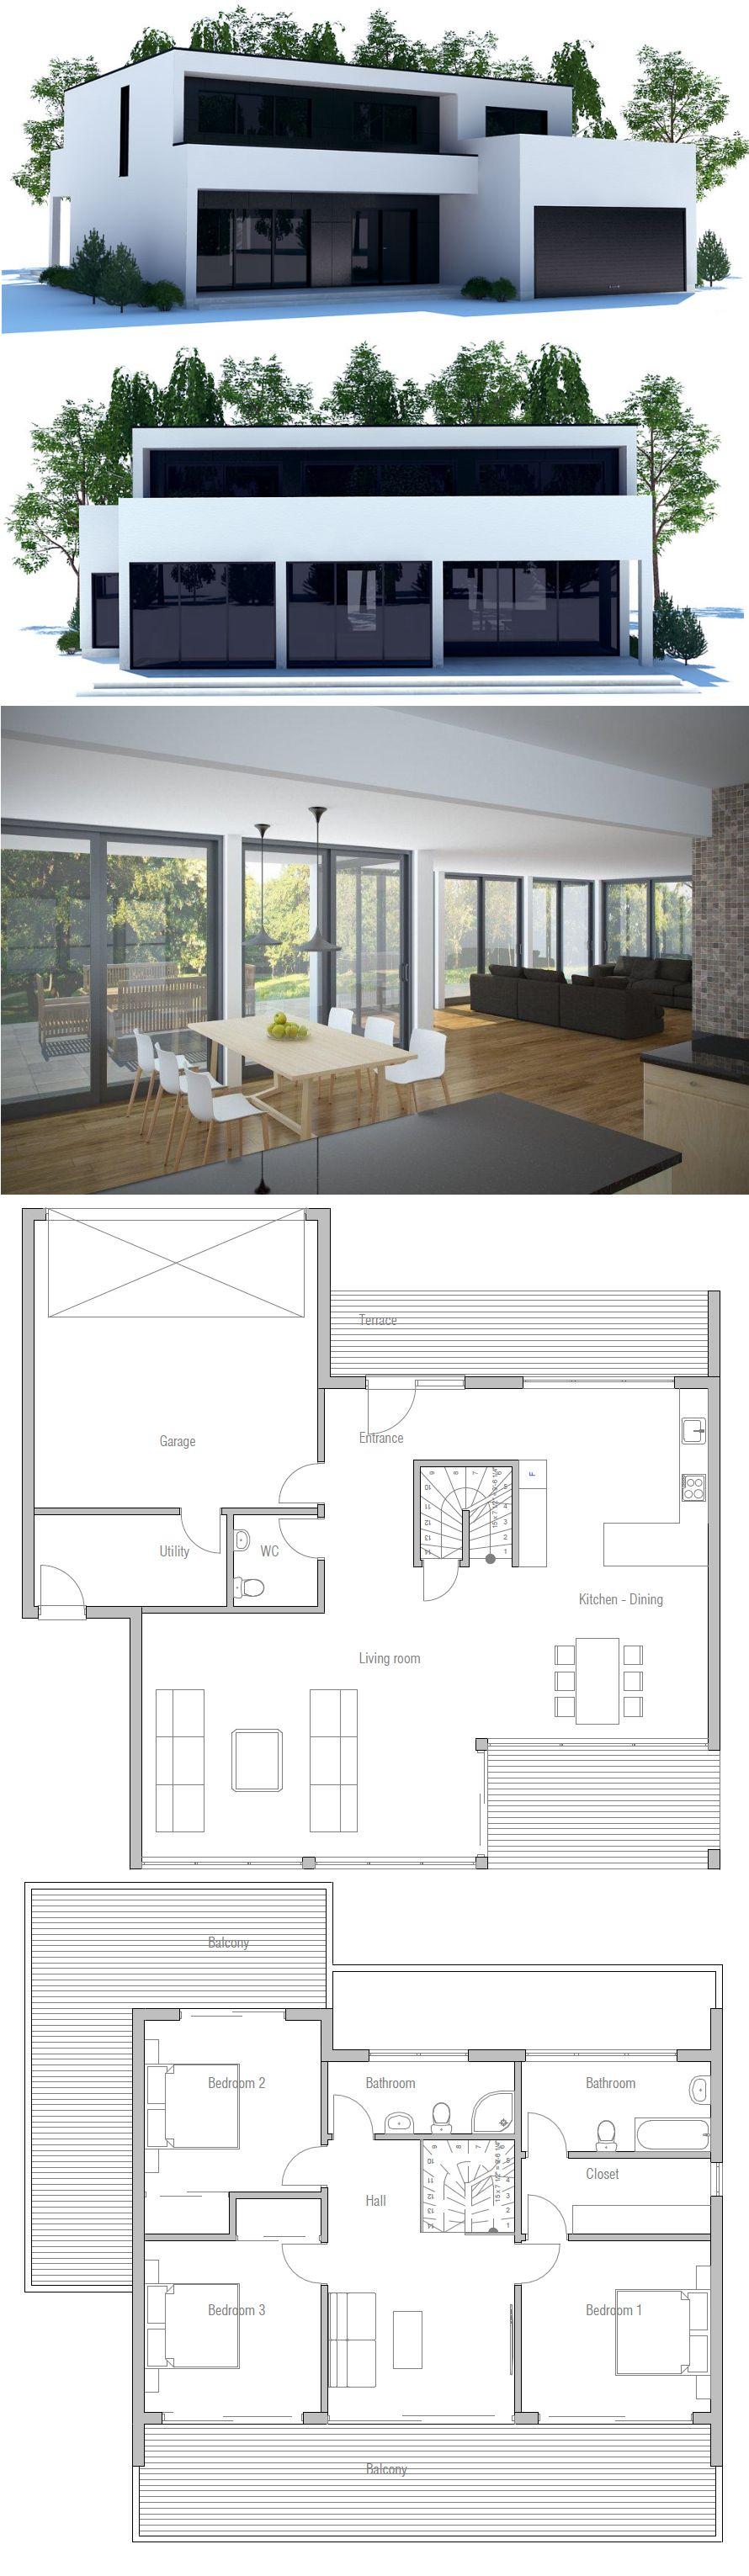 Modern Minimalist House Plan Home sweet home